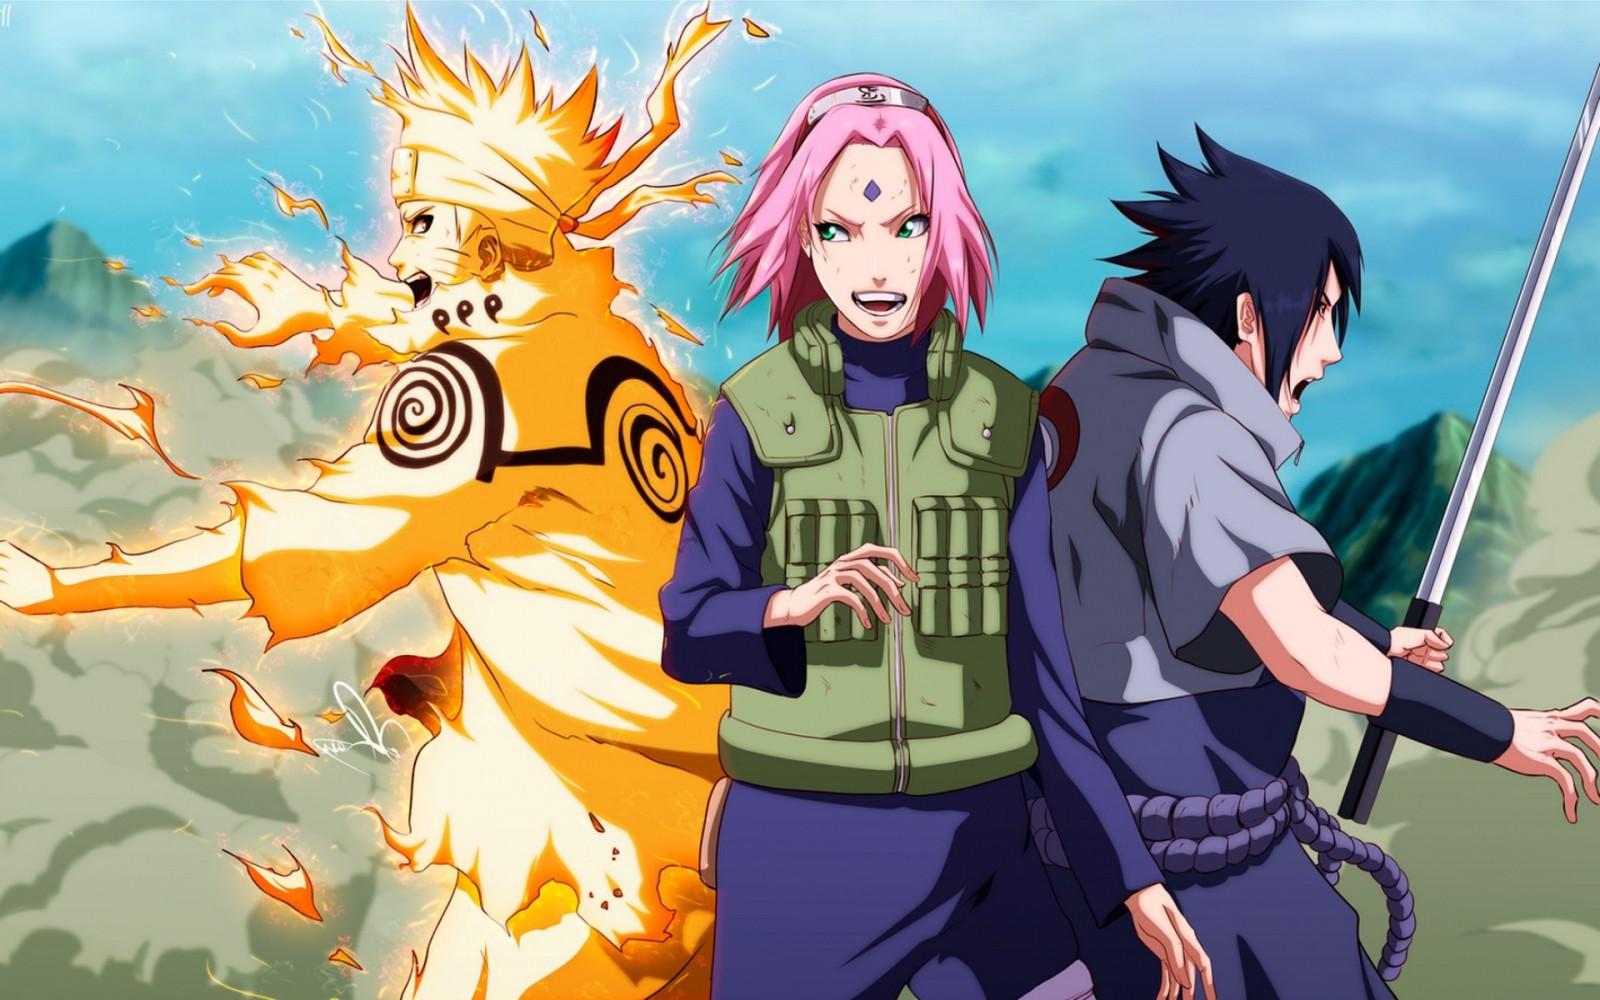 Fond d'écran : illustration, Anime, Manga, Uzumaki Naruto, Haruno Sakura, Uchiha Sasuke, capture ...